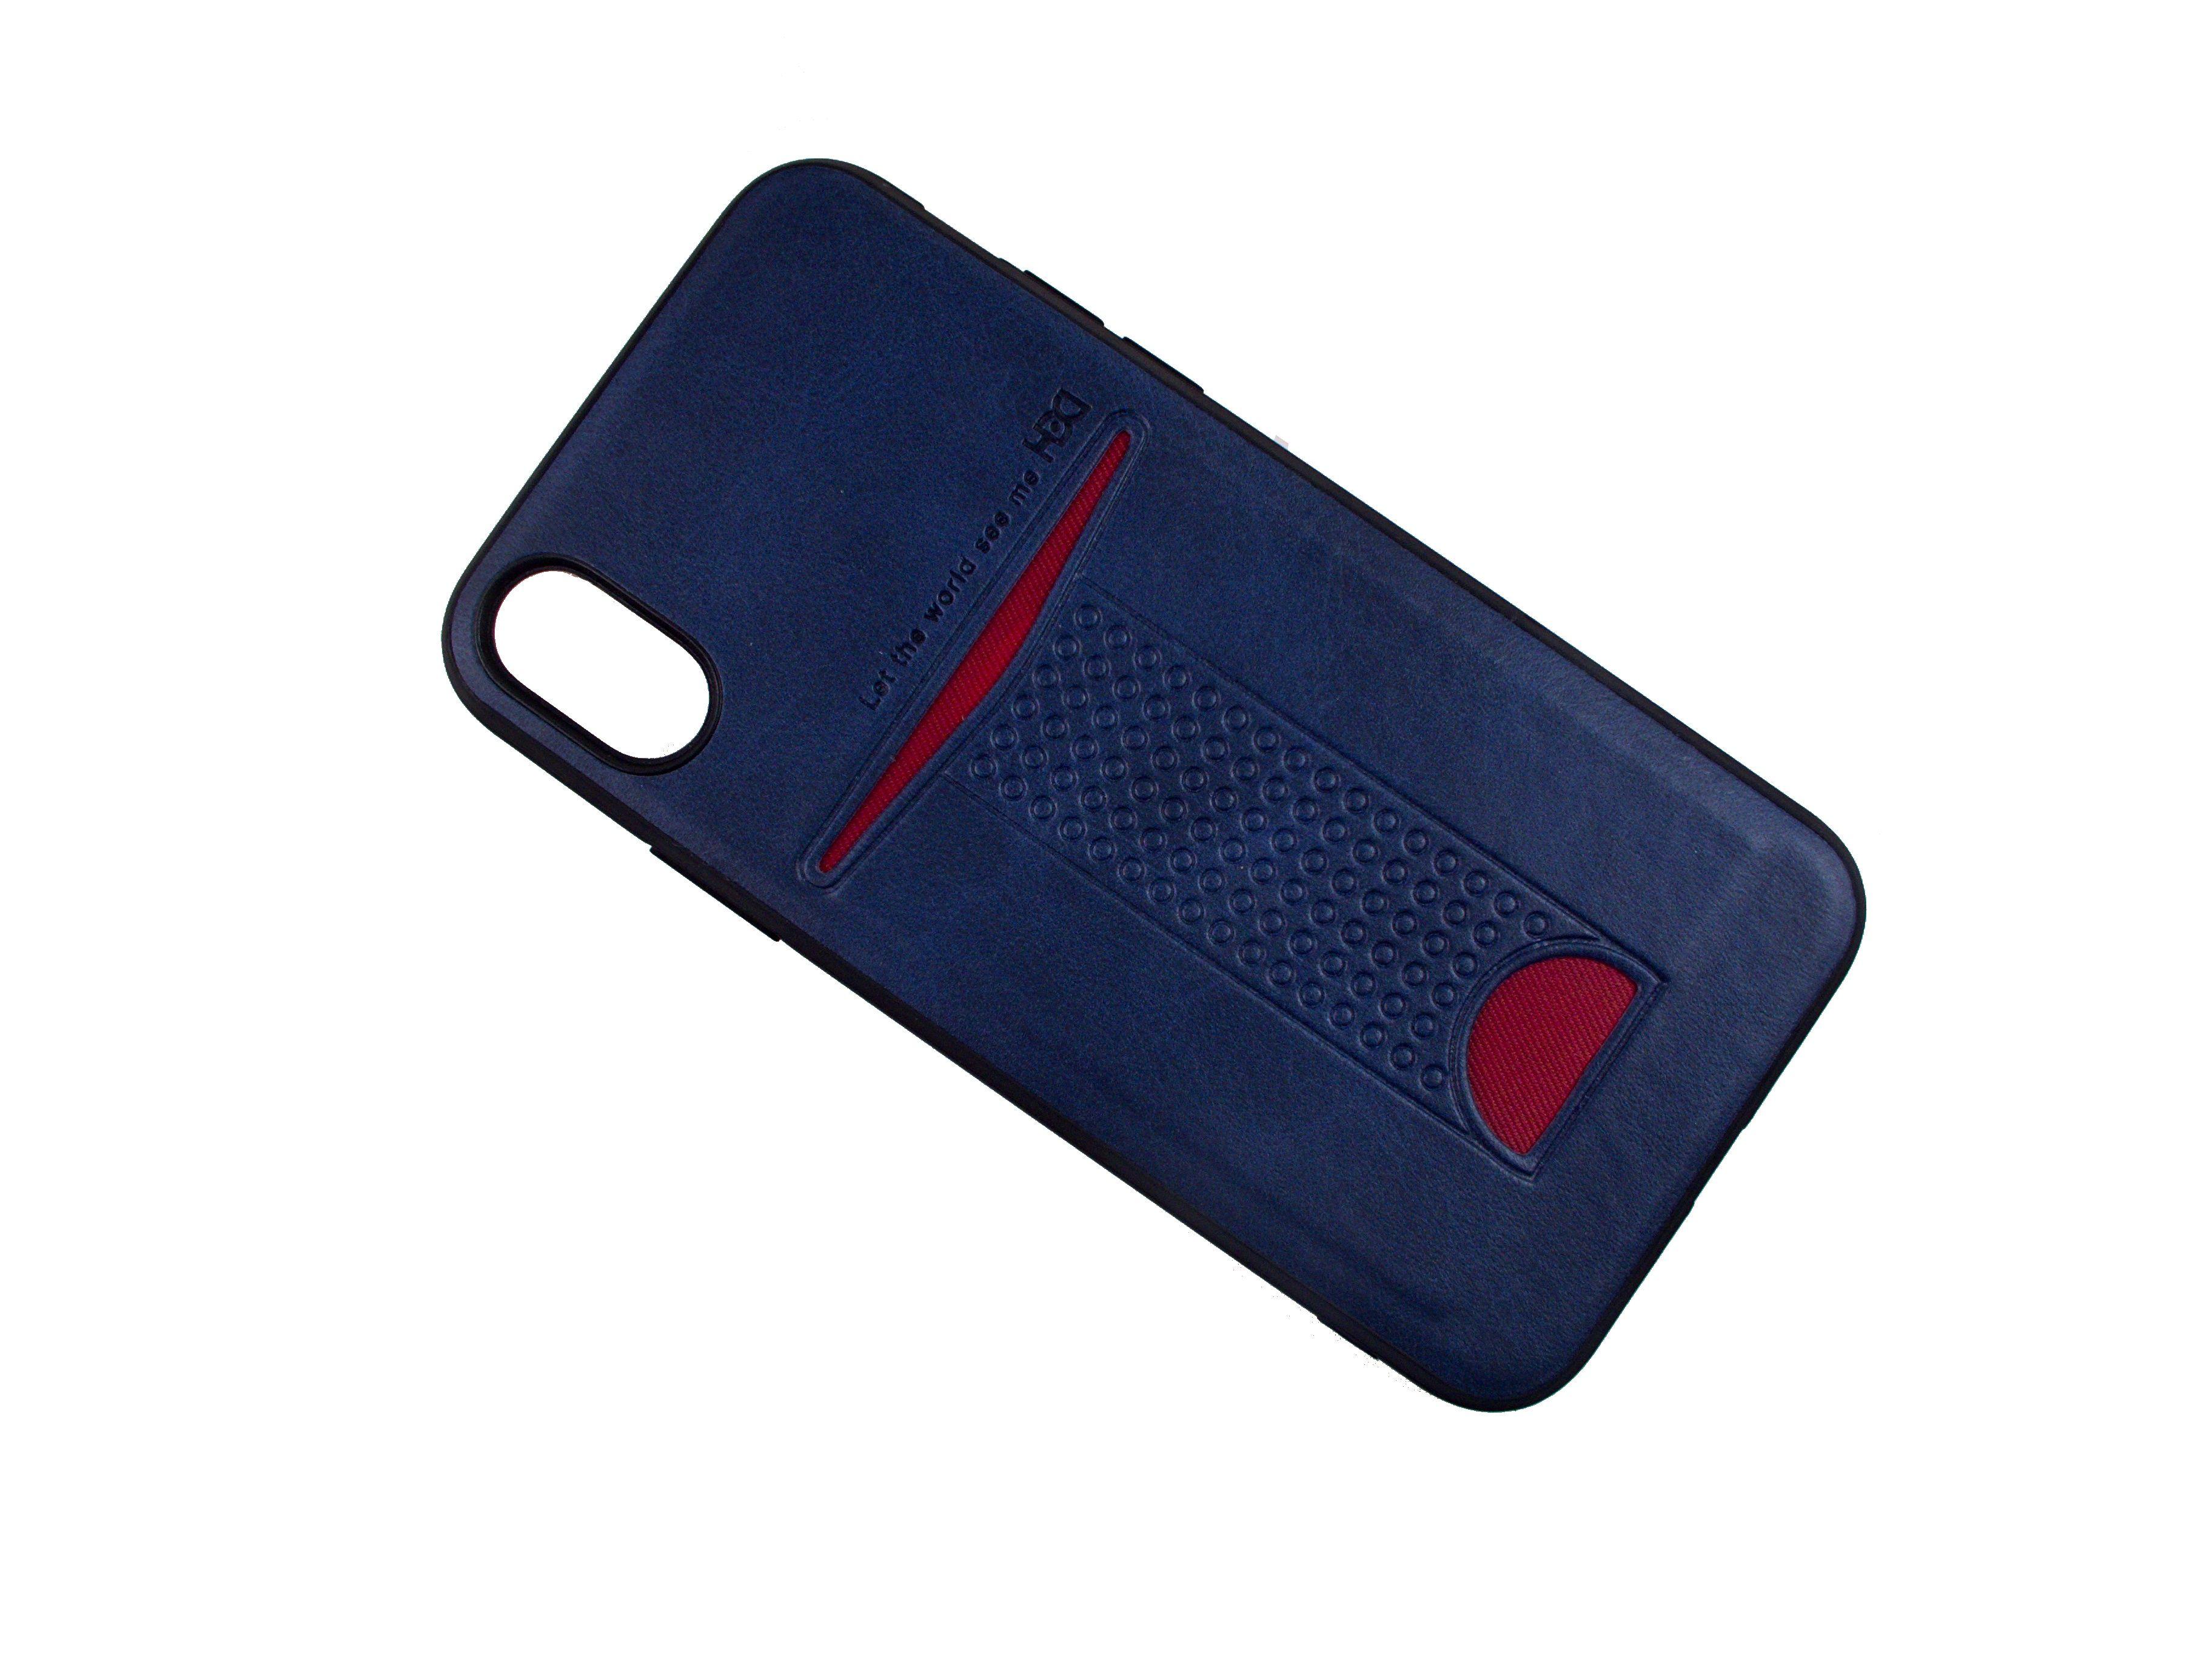 Mercury Jelly Case Iphone X Red Goospery 7 Plus Canvas Diary Navy Precious Blue